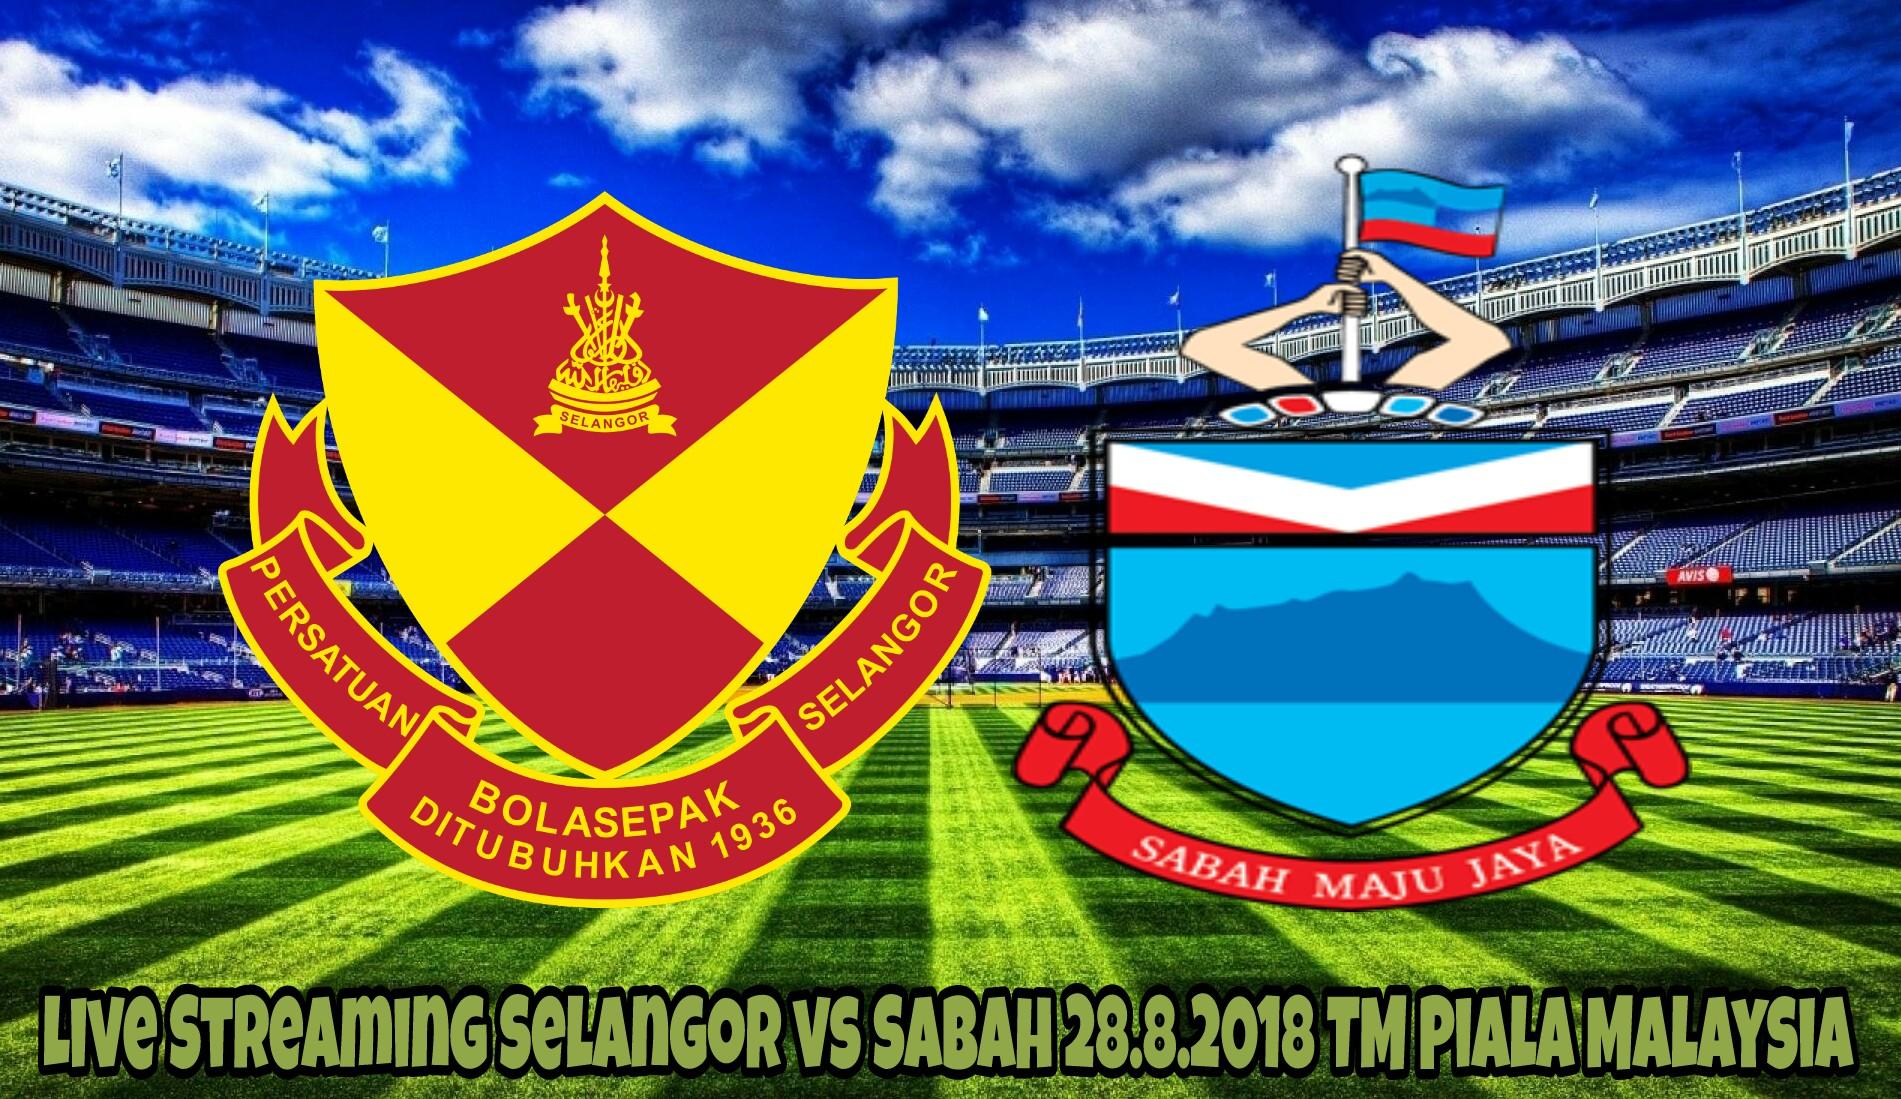 Live Streaming Selangor vs Sabah 28.8.2018 TM Piala Malaysia